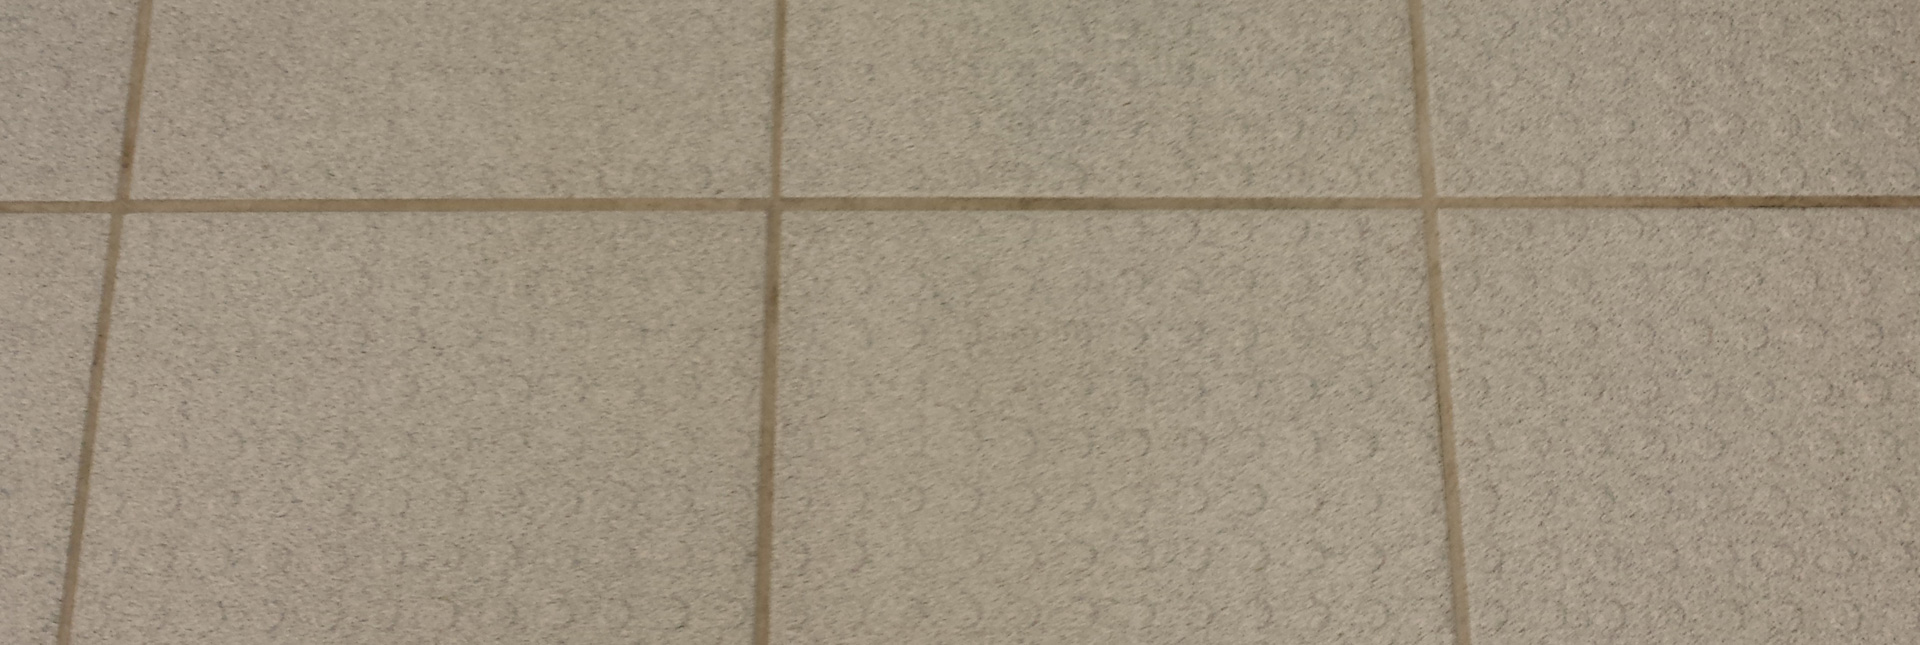 commercial-tile-grout-2